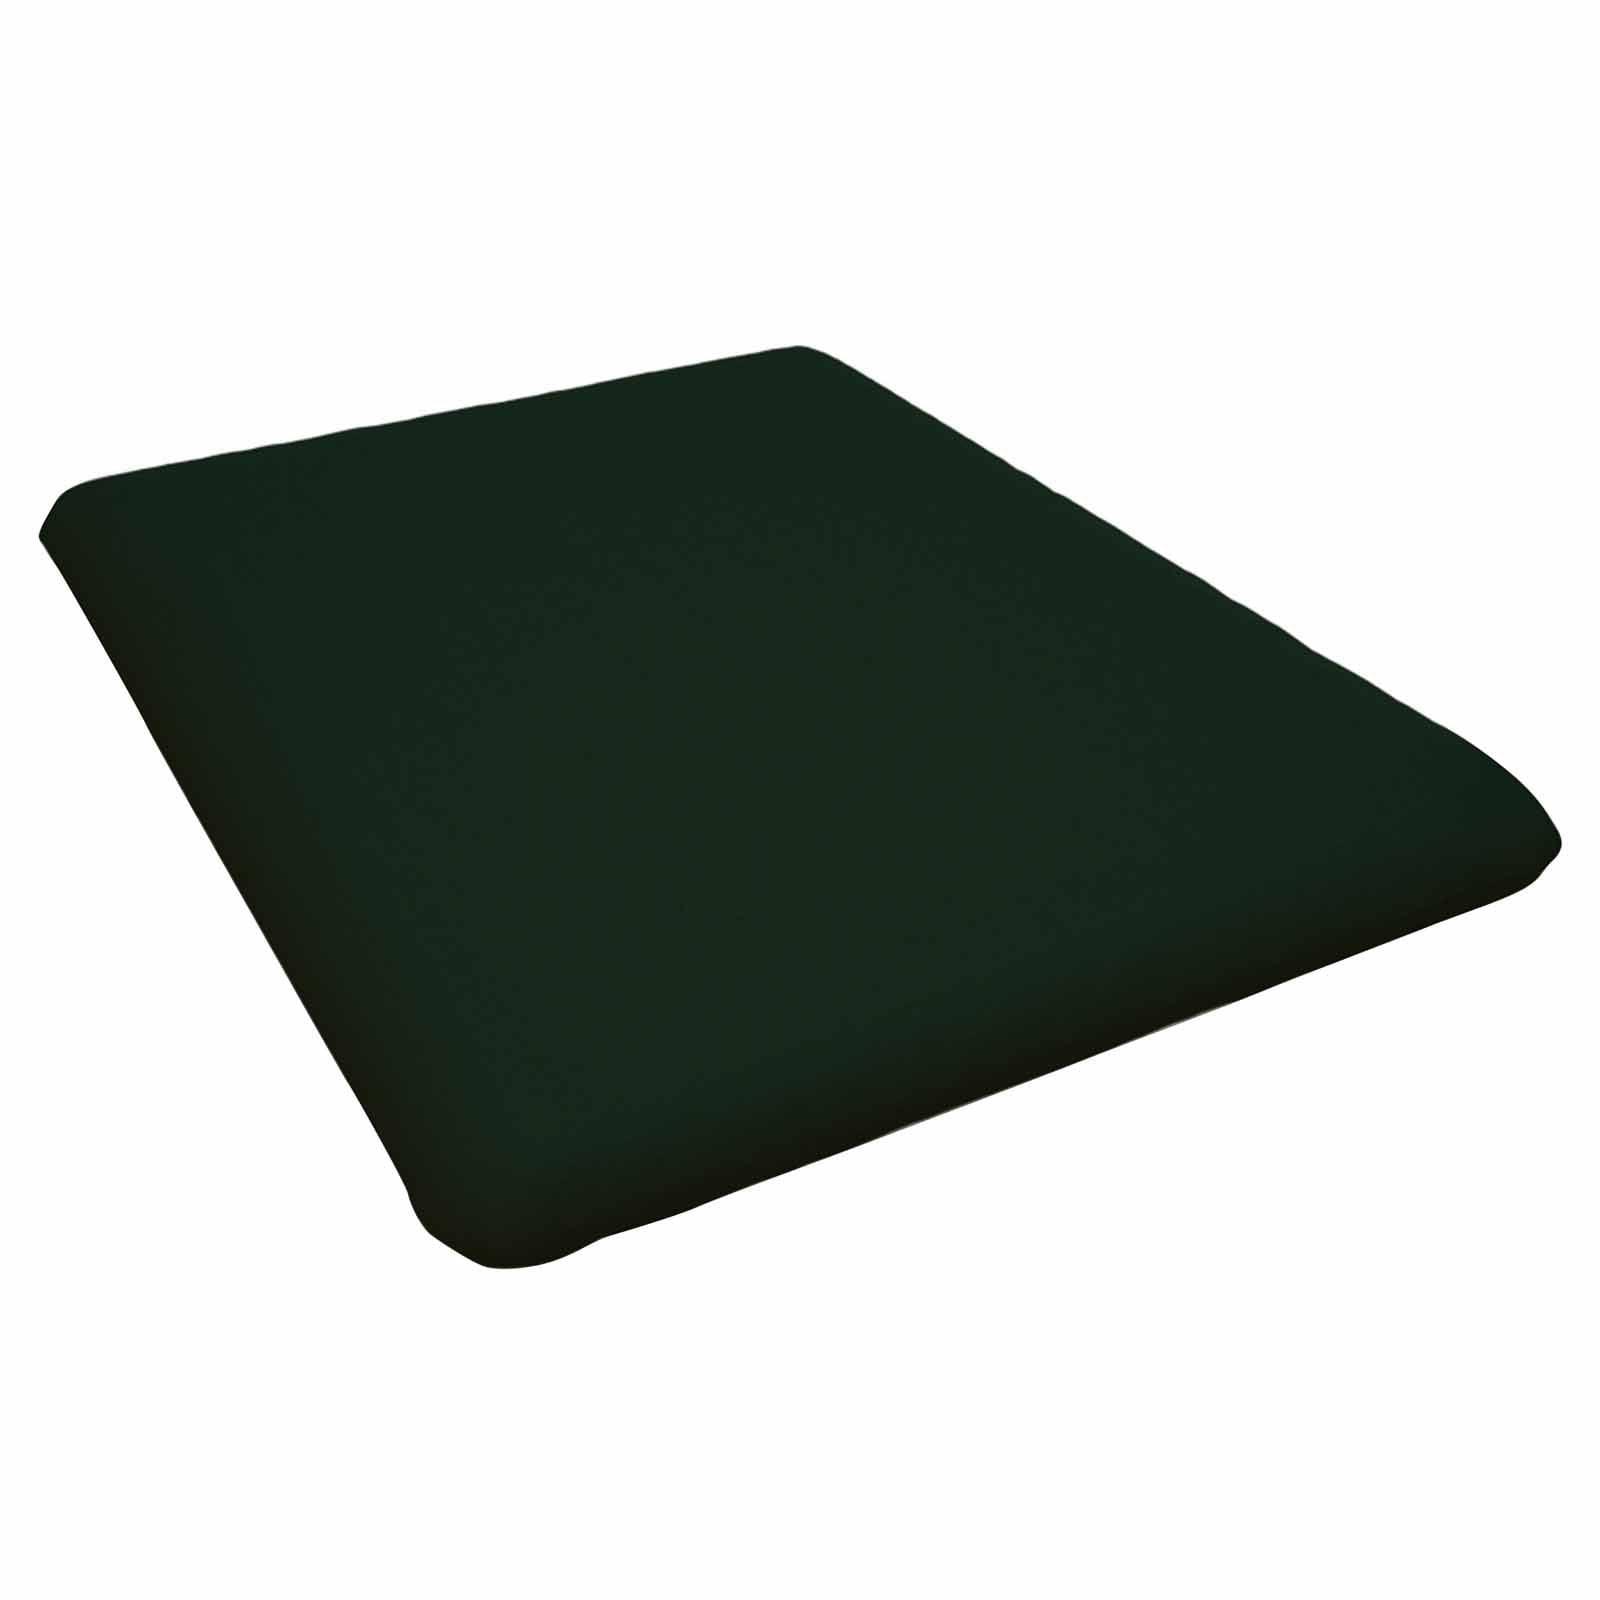 Polywood Sunbrella 17.25 x 22 in. Adirondack Seat Cushion